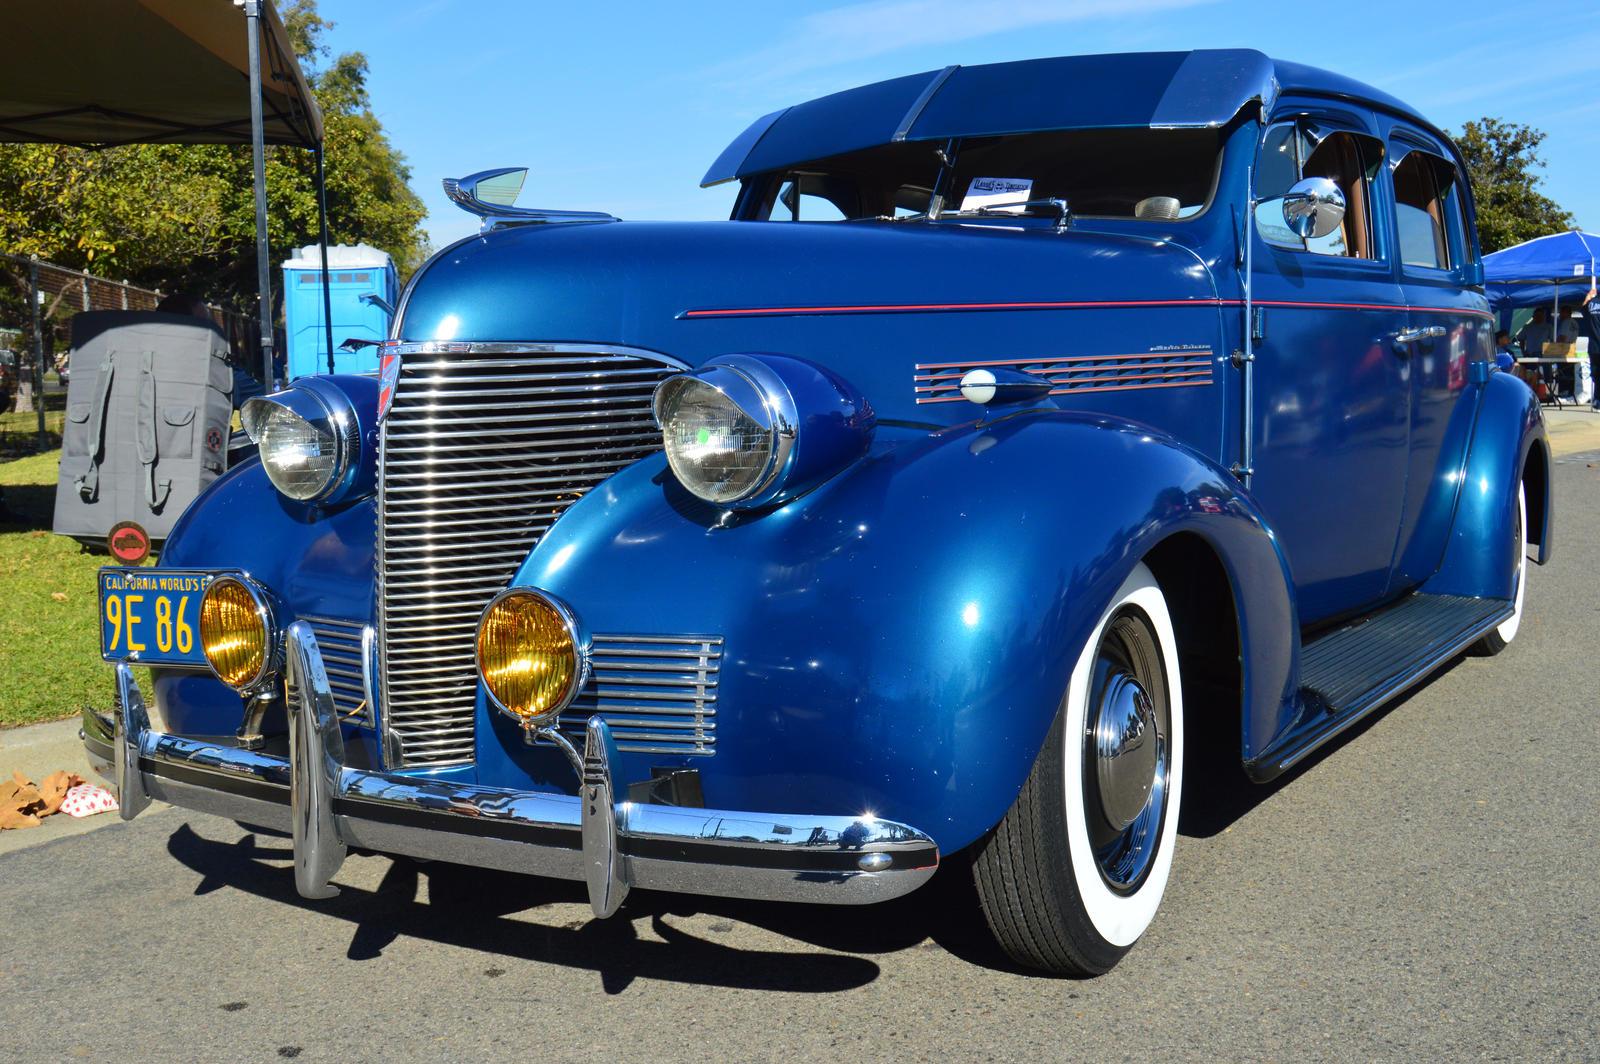 1939 Chevrolet Master Deluxe IX by Brooklyn47 on DeviantArt